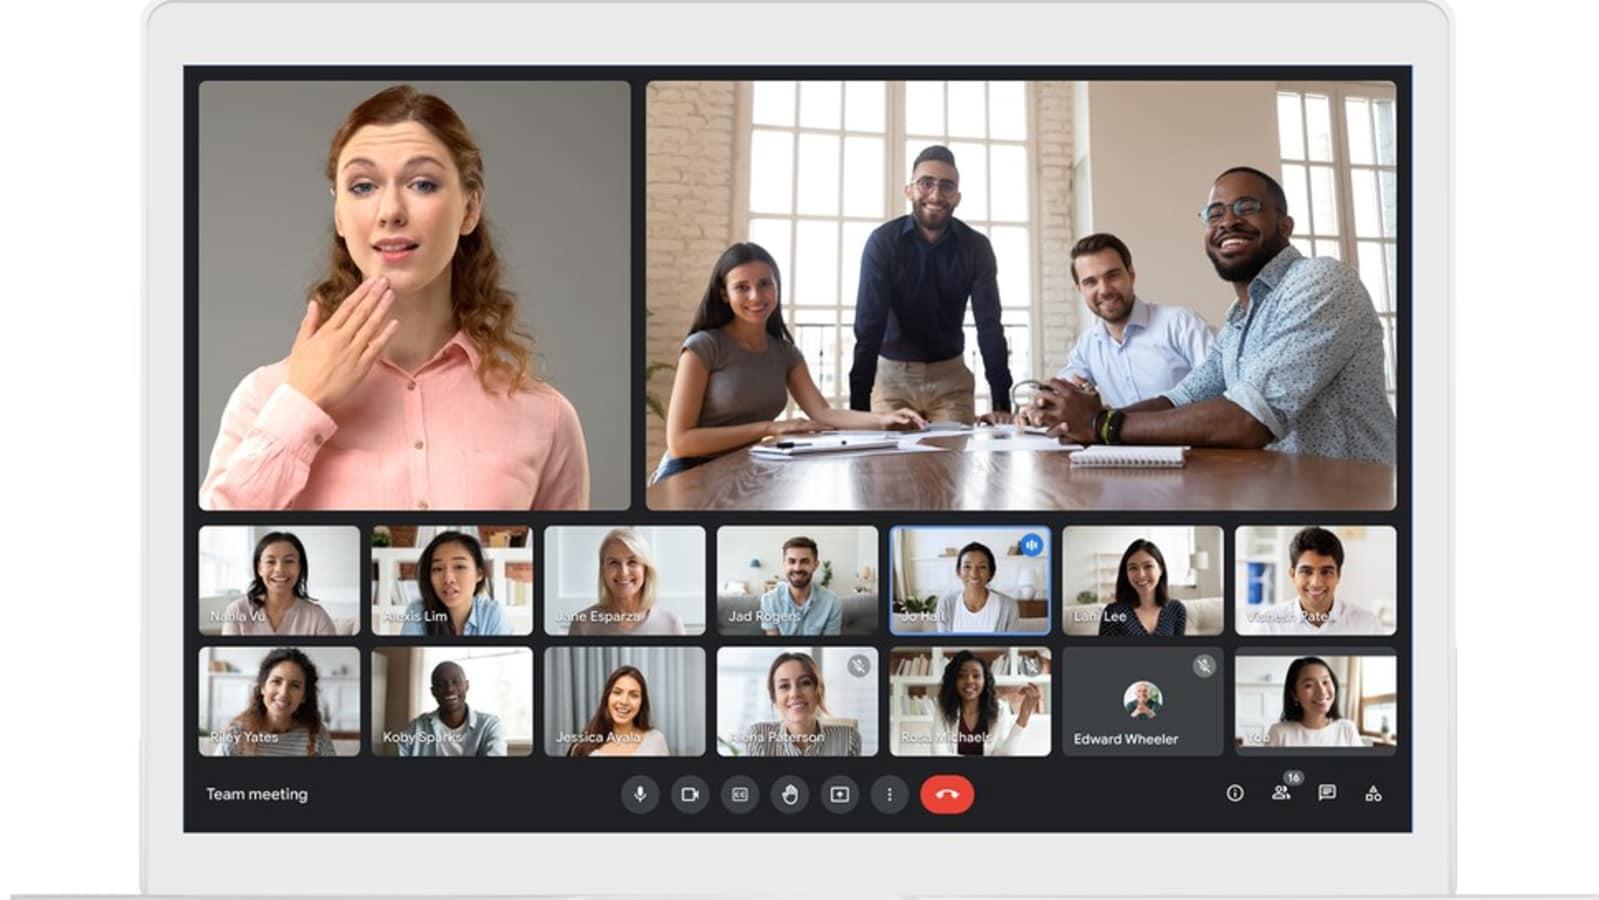 Google Meet video call: How to schedule a meeting